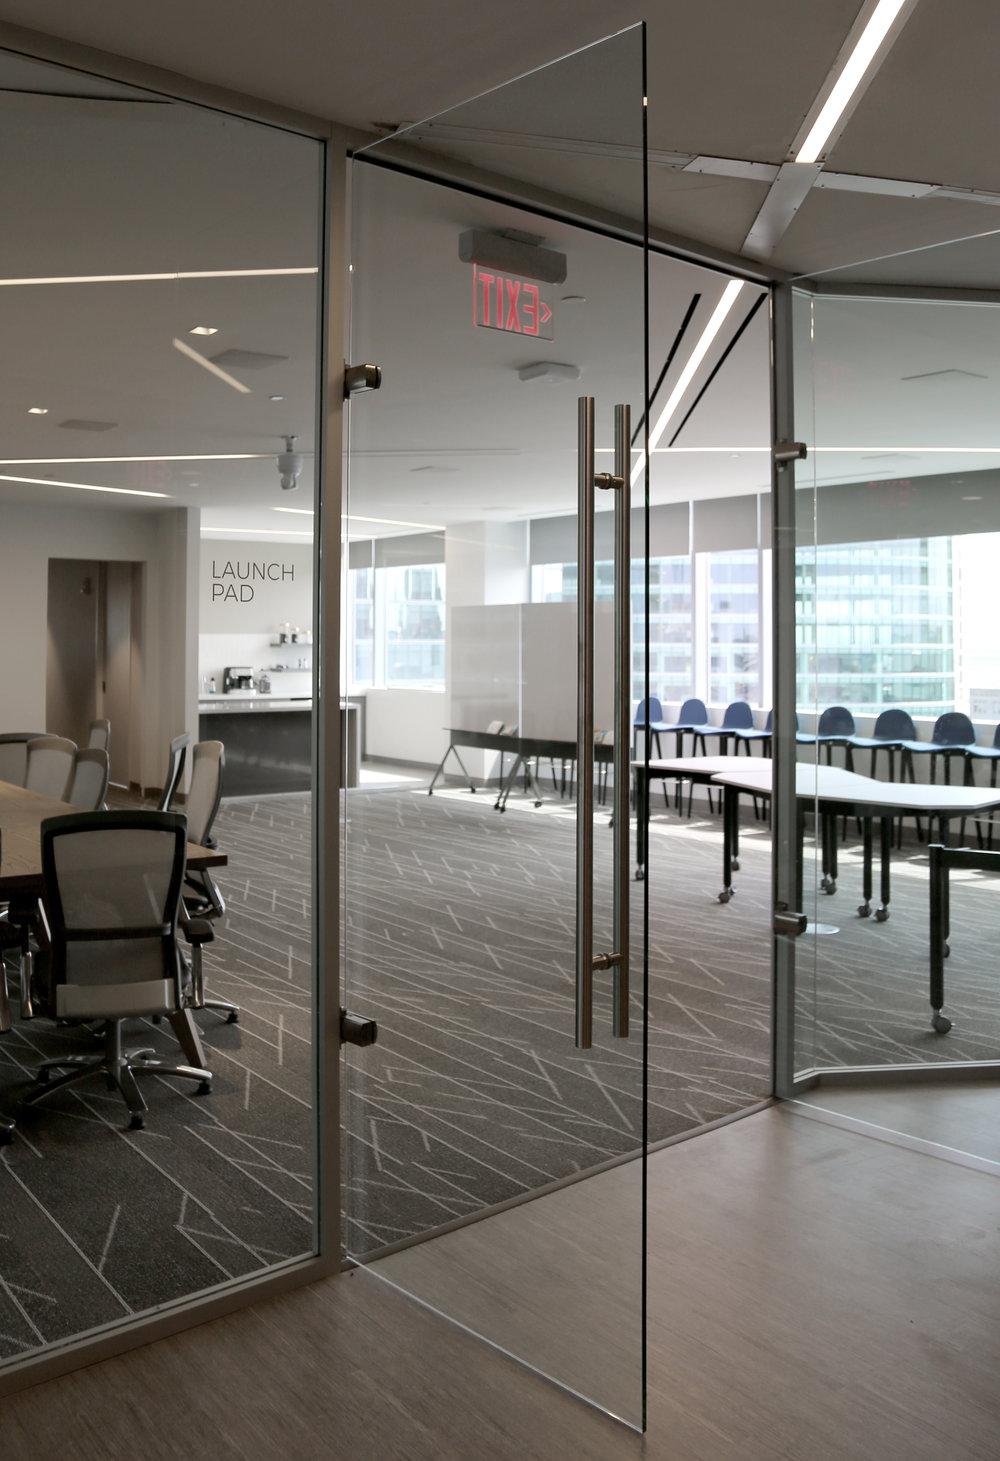 Litespace Reception Frameless Glass Double Door Aluminum Framed System - Spaceworks AI.jpg